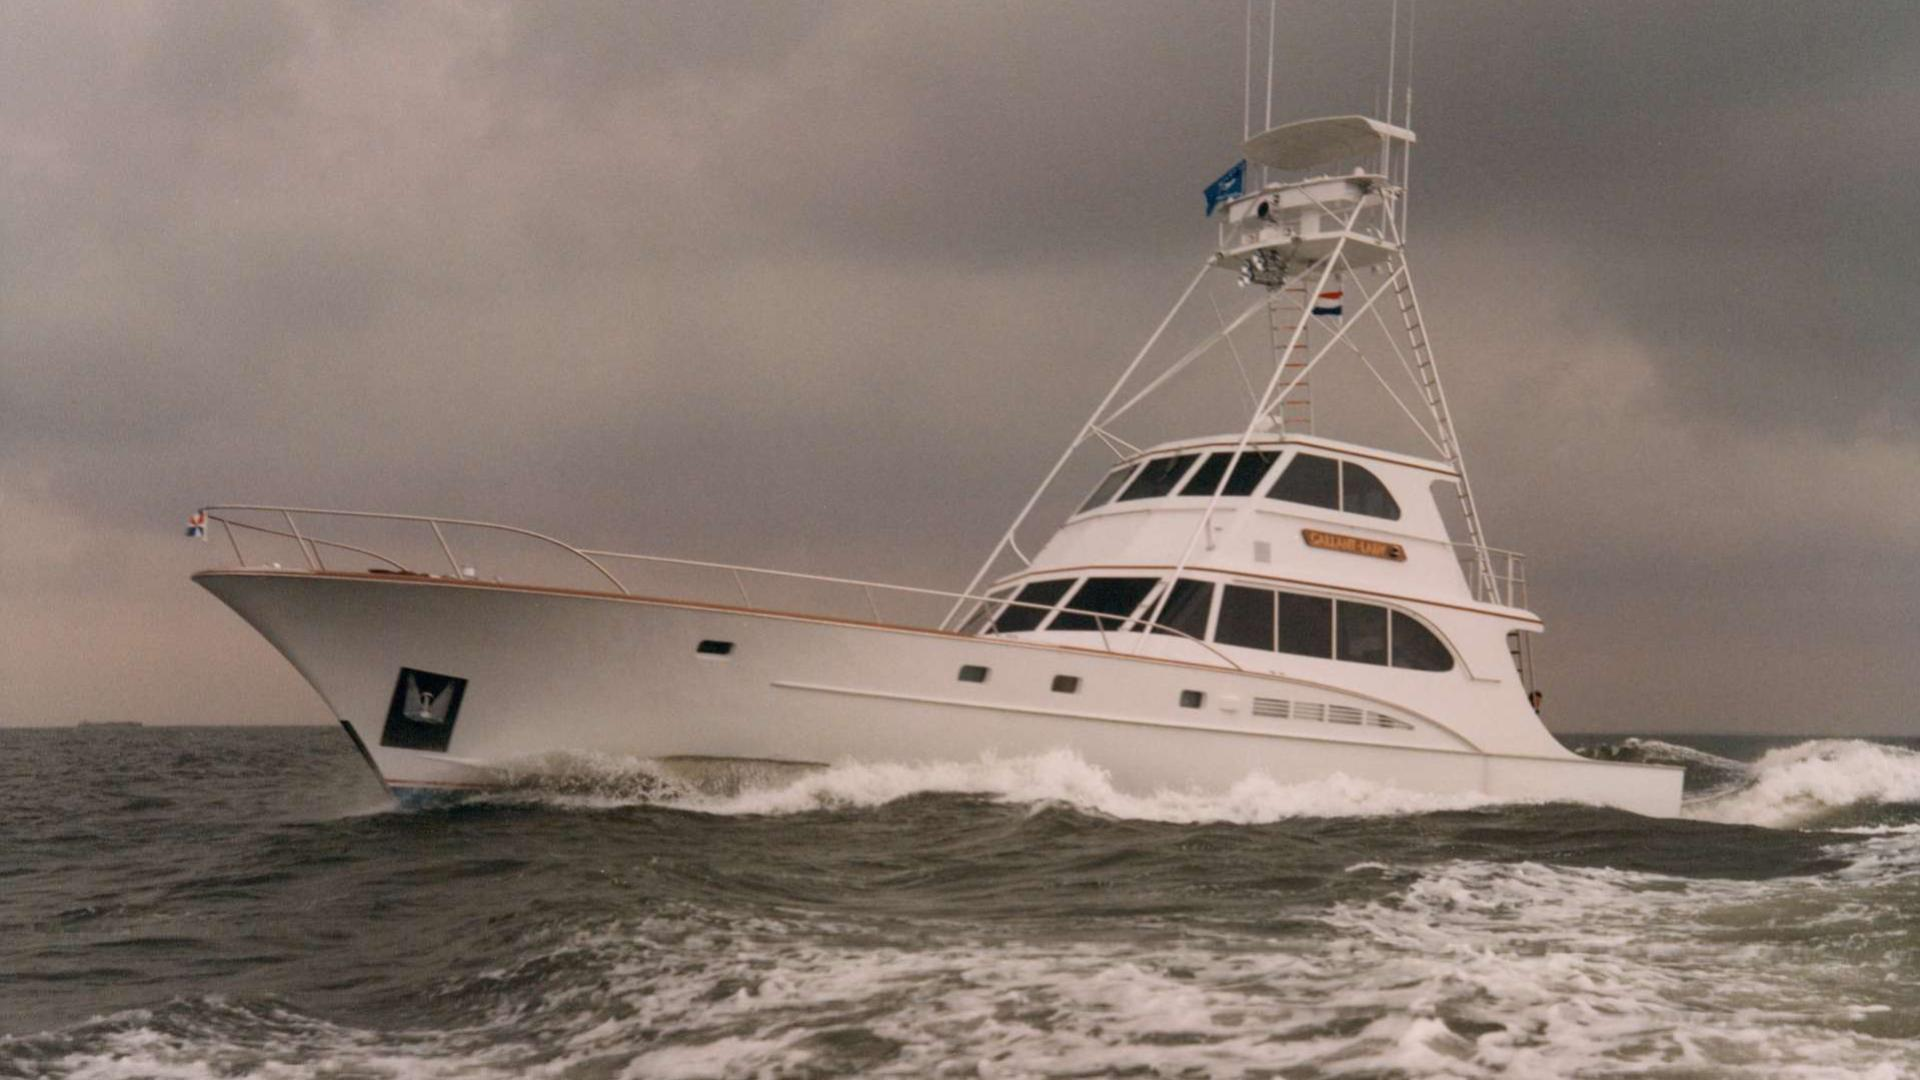 comanche-motor-yacht-feadship-1985-27m-cruising